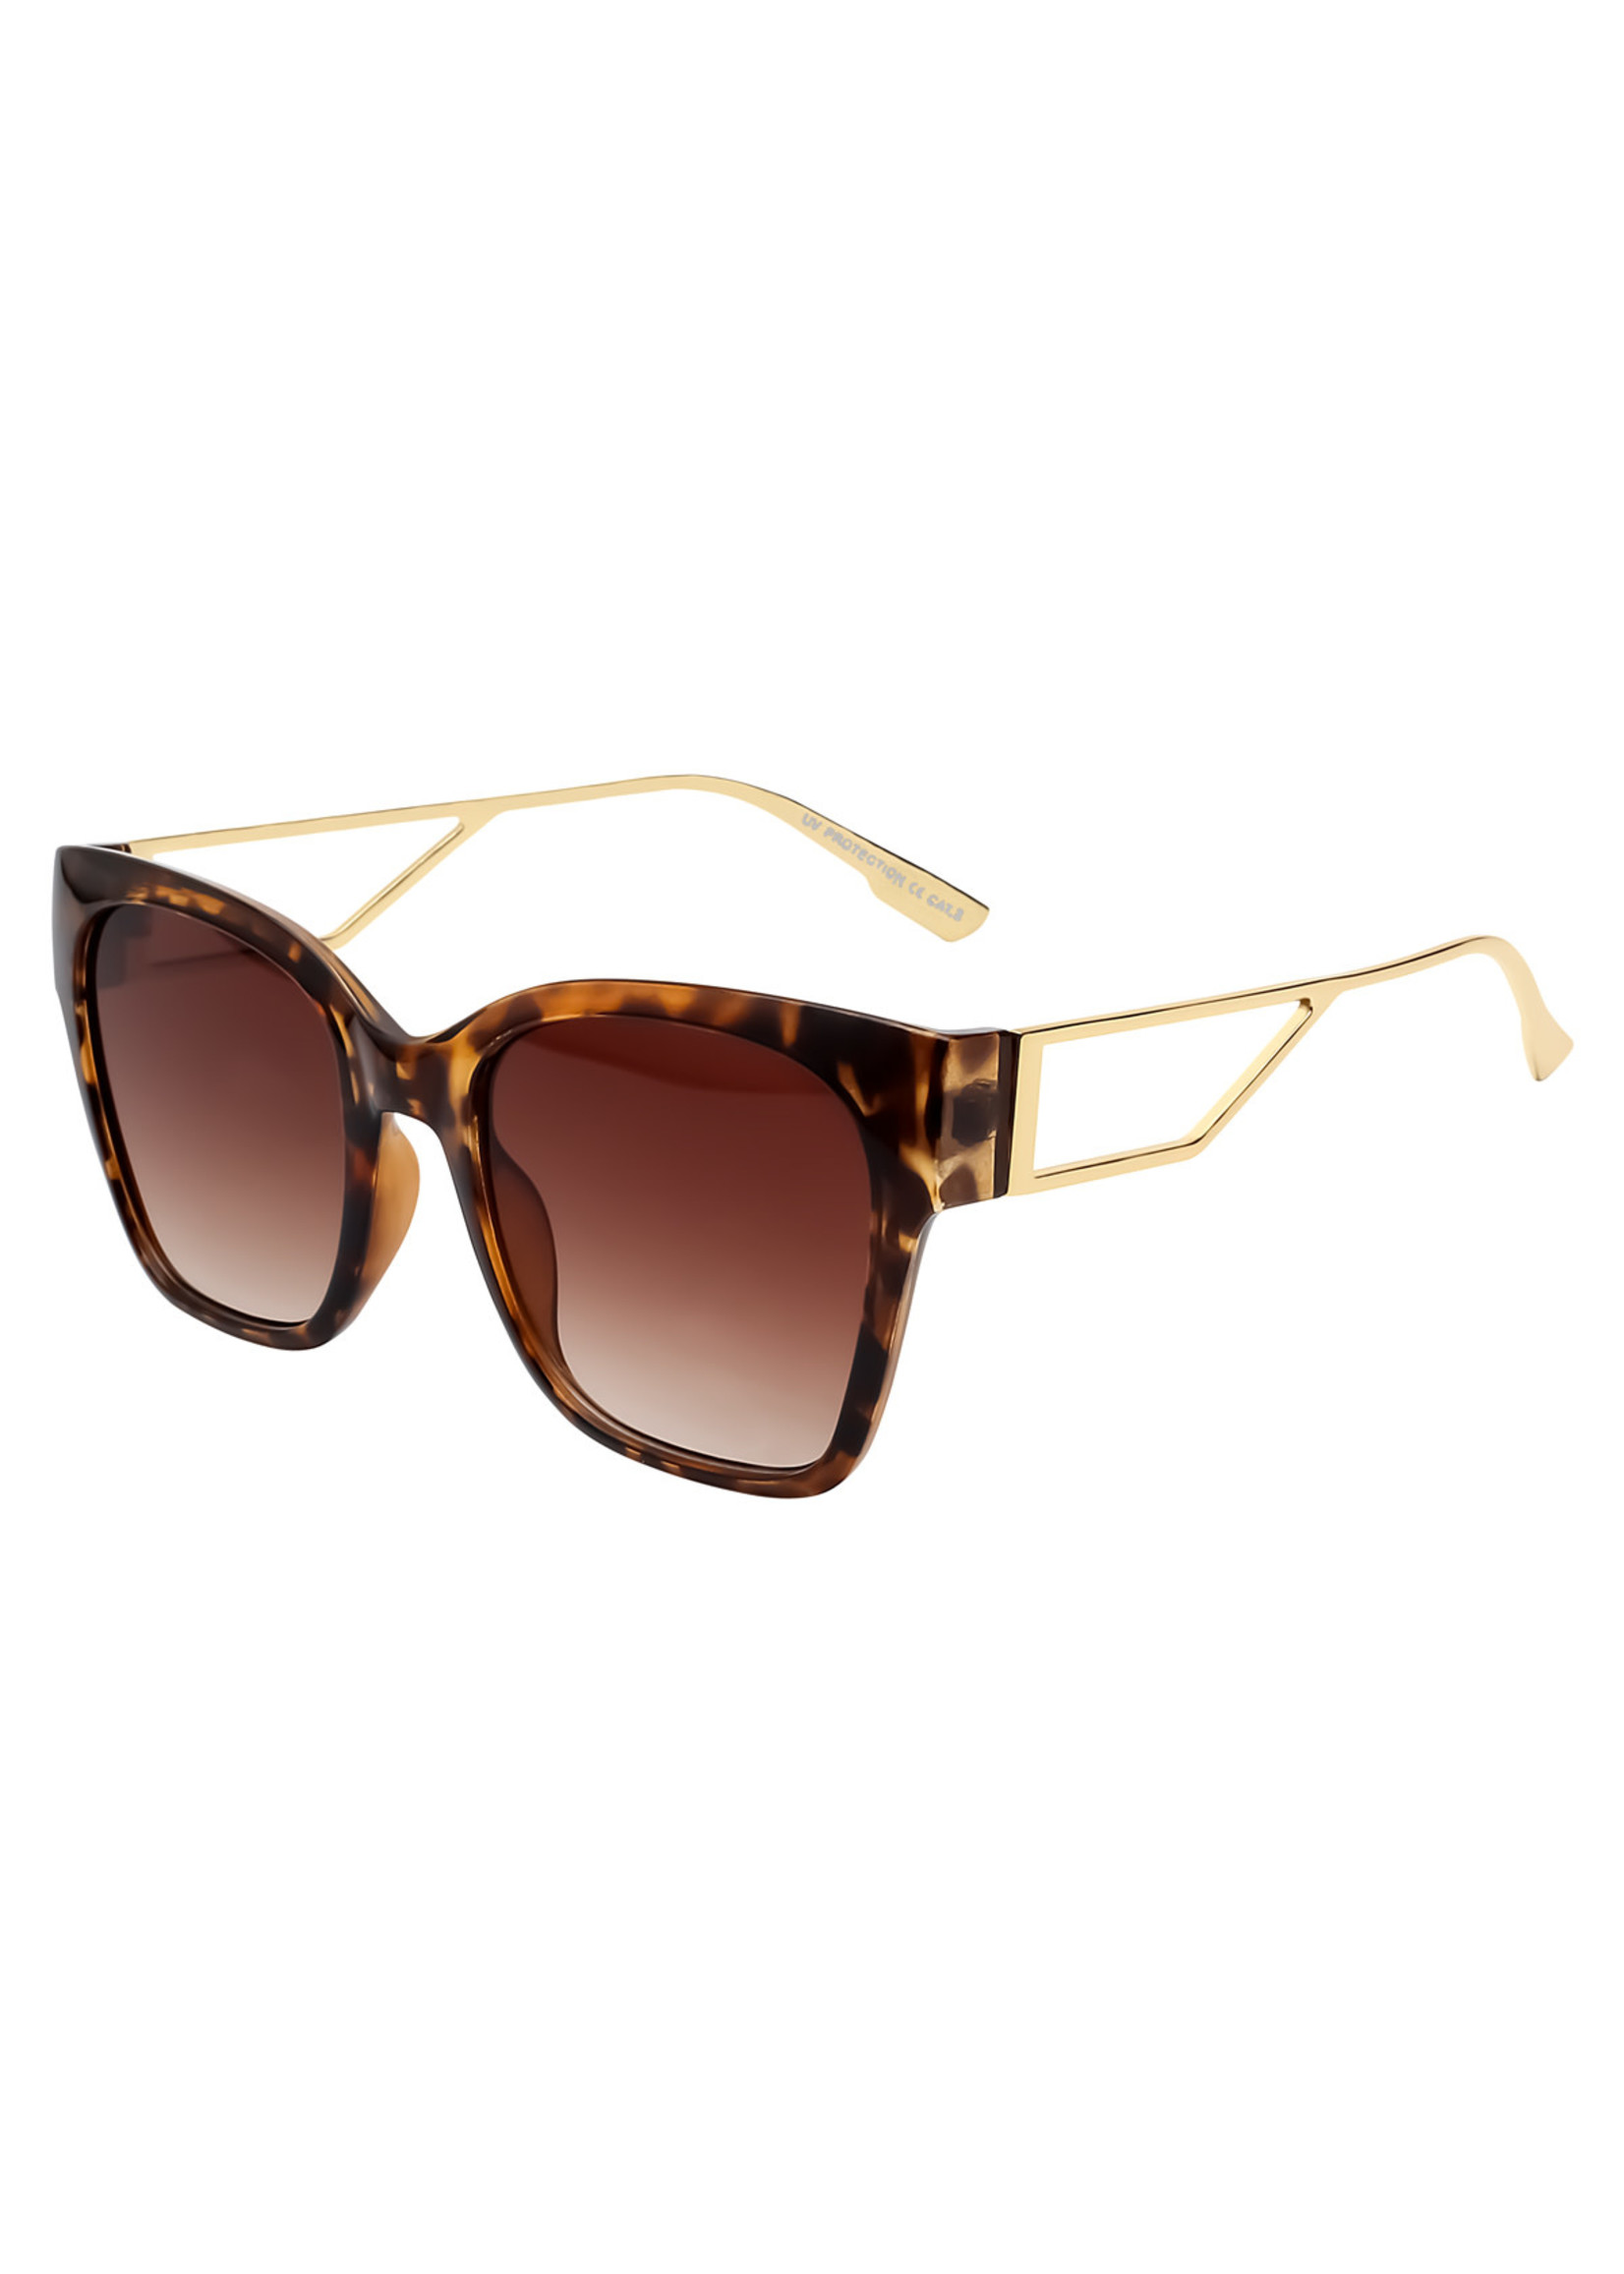 Ladybugs Zonnebril Frame It Brown/Gold